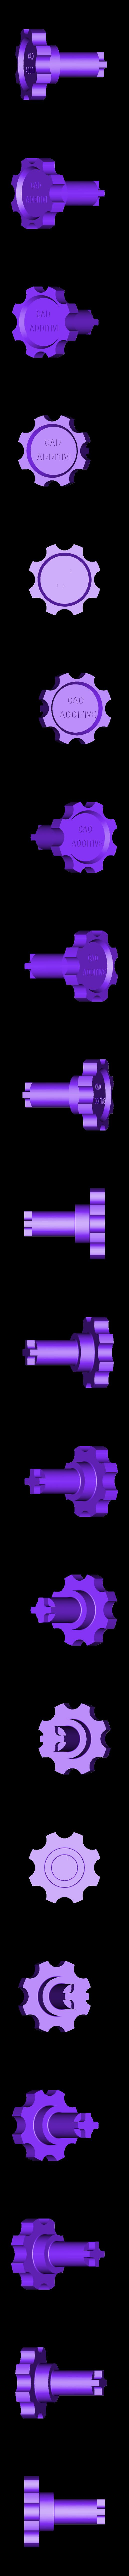 Planet Carrier lower.STL Download free STL file Epicyclic Bevel Gear Toy • 3D printer design, montuparmar1